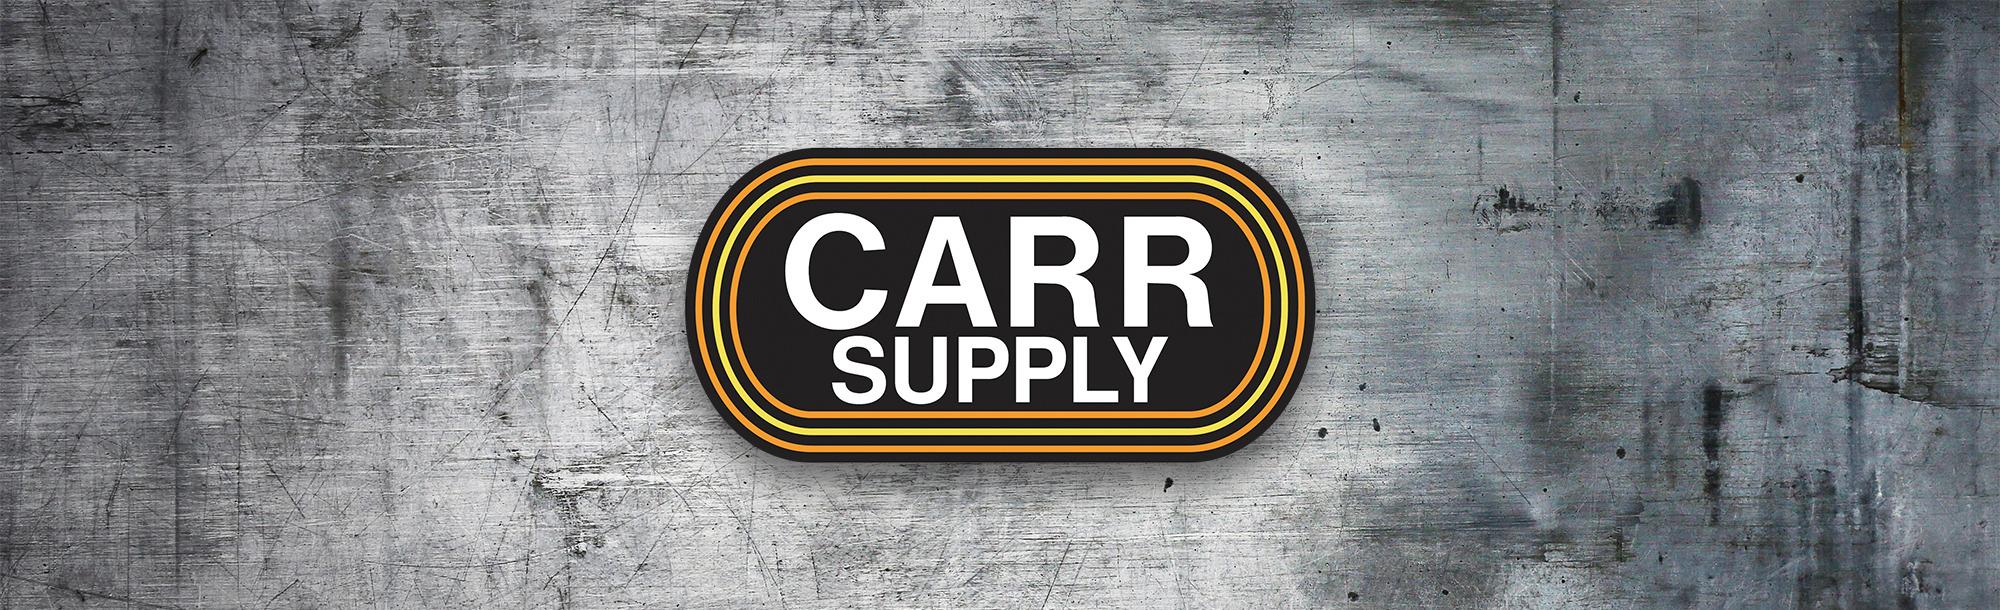 carr banner